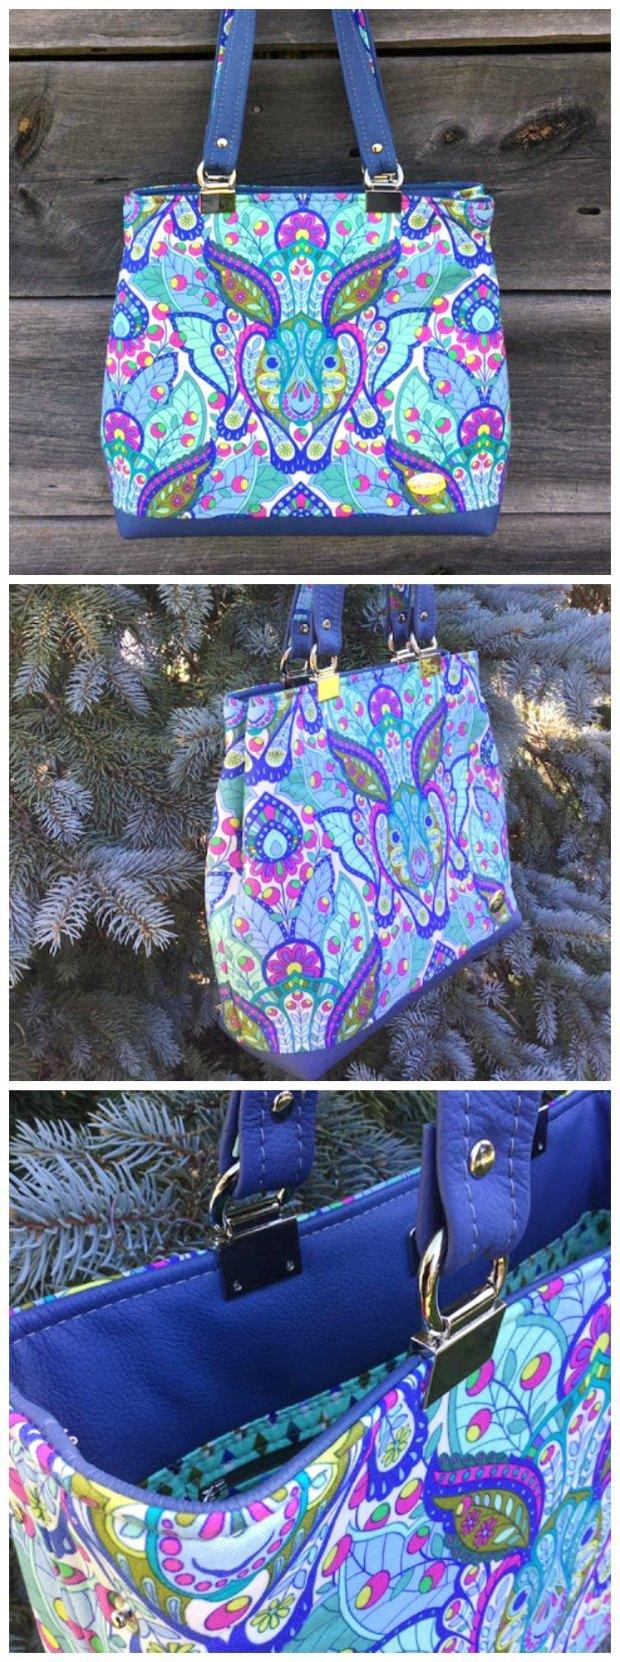 Geeky image intended for handbag patterns free printable